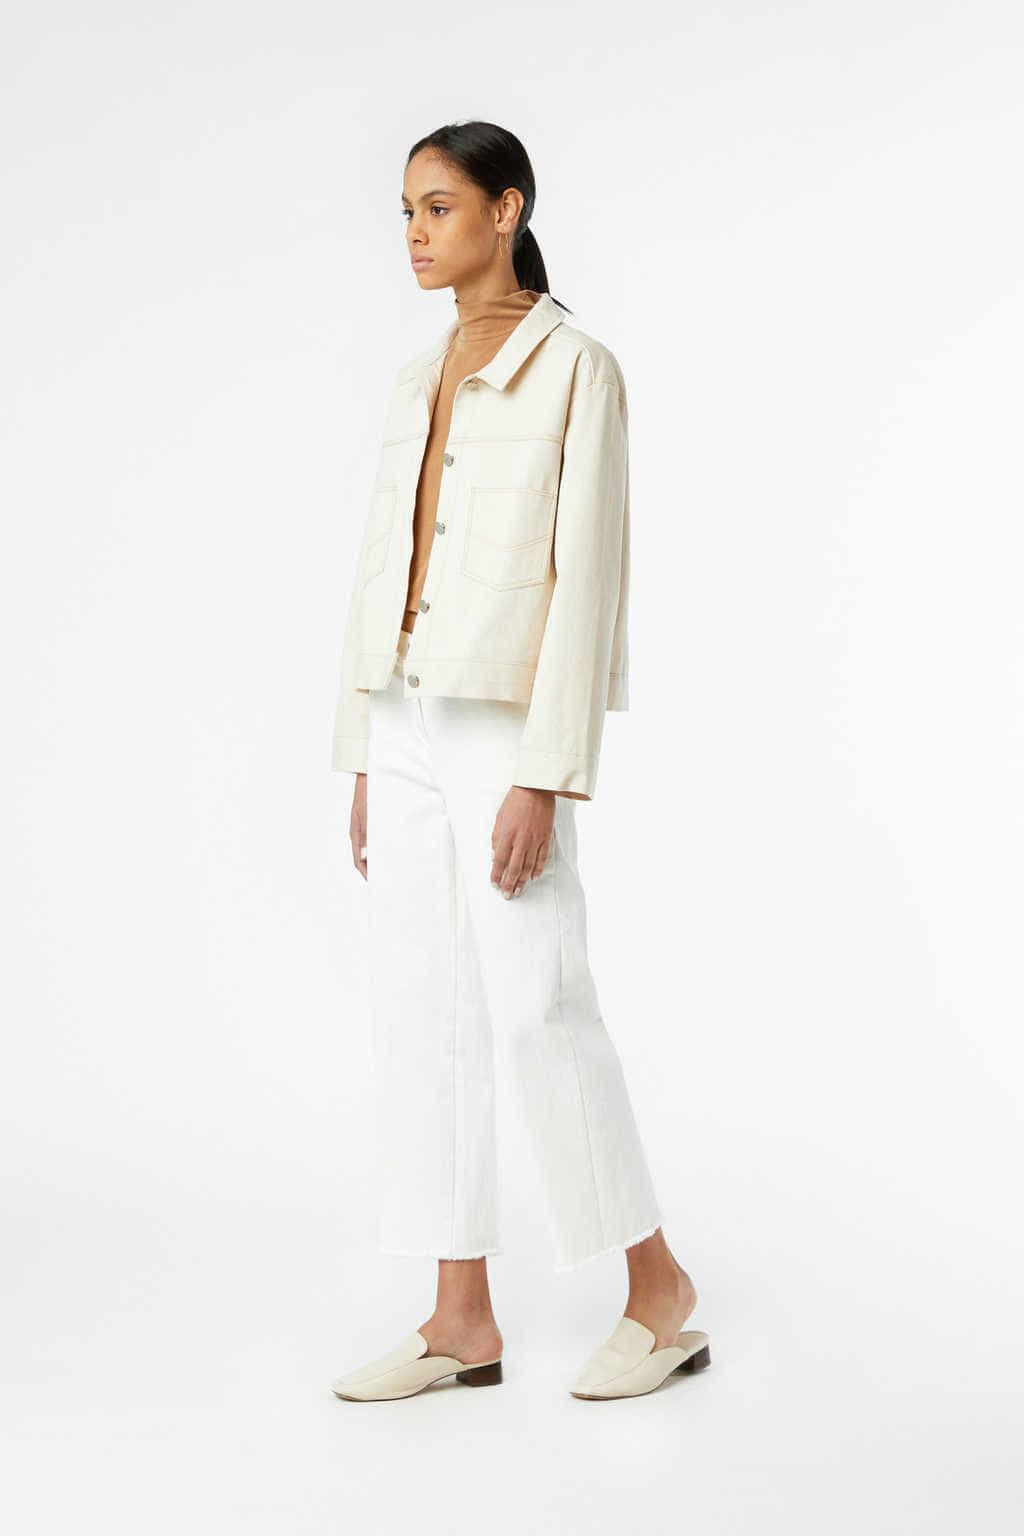 Jacket J011 Cream 3